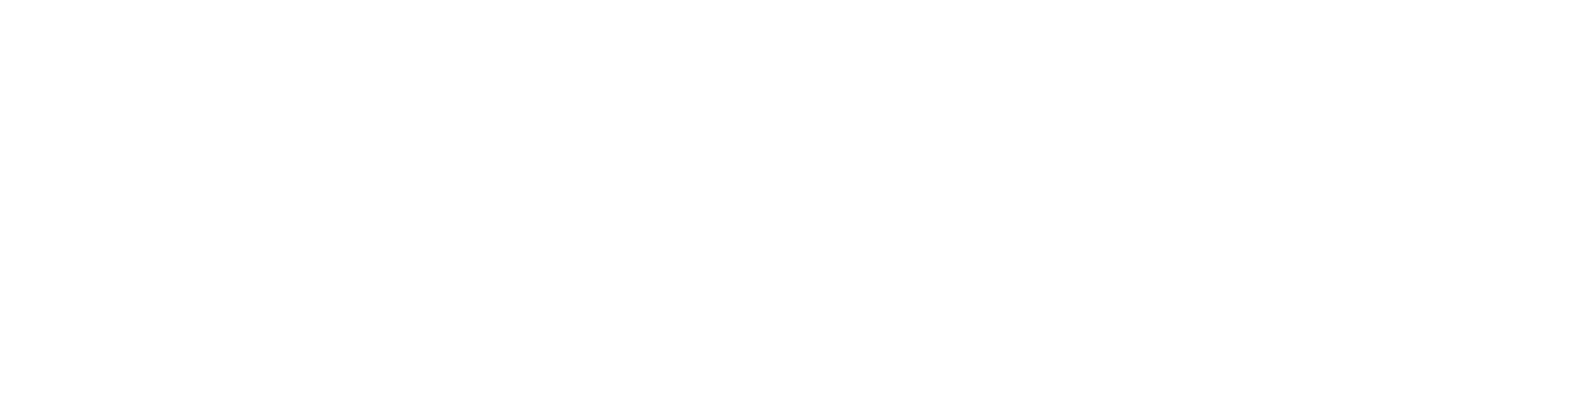 Smagroove - Liveband